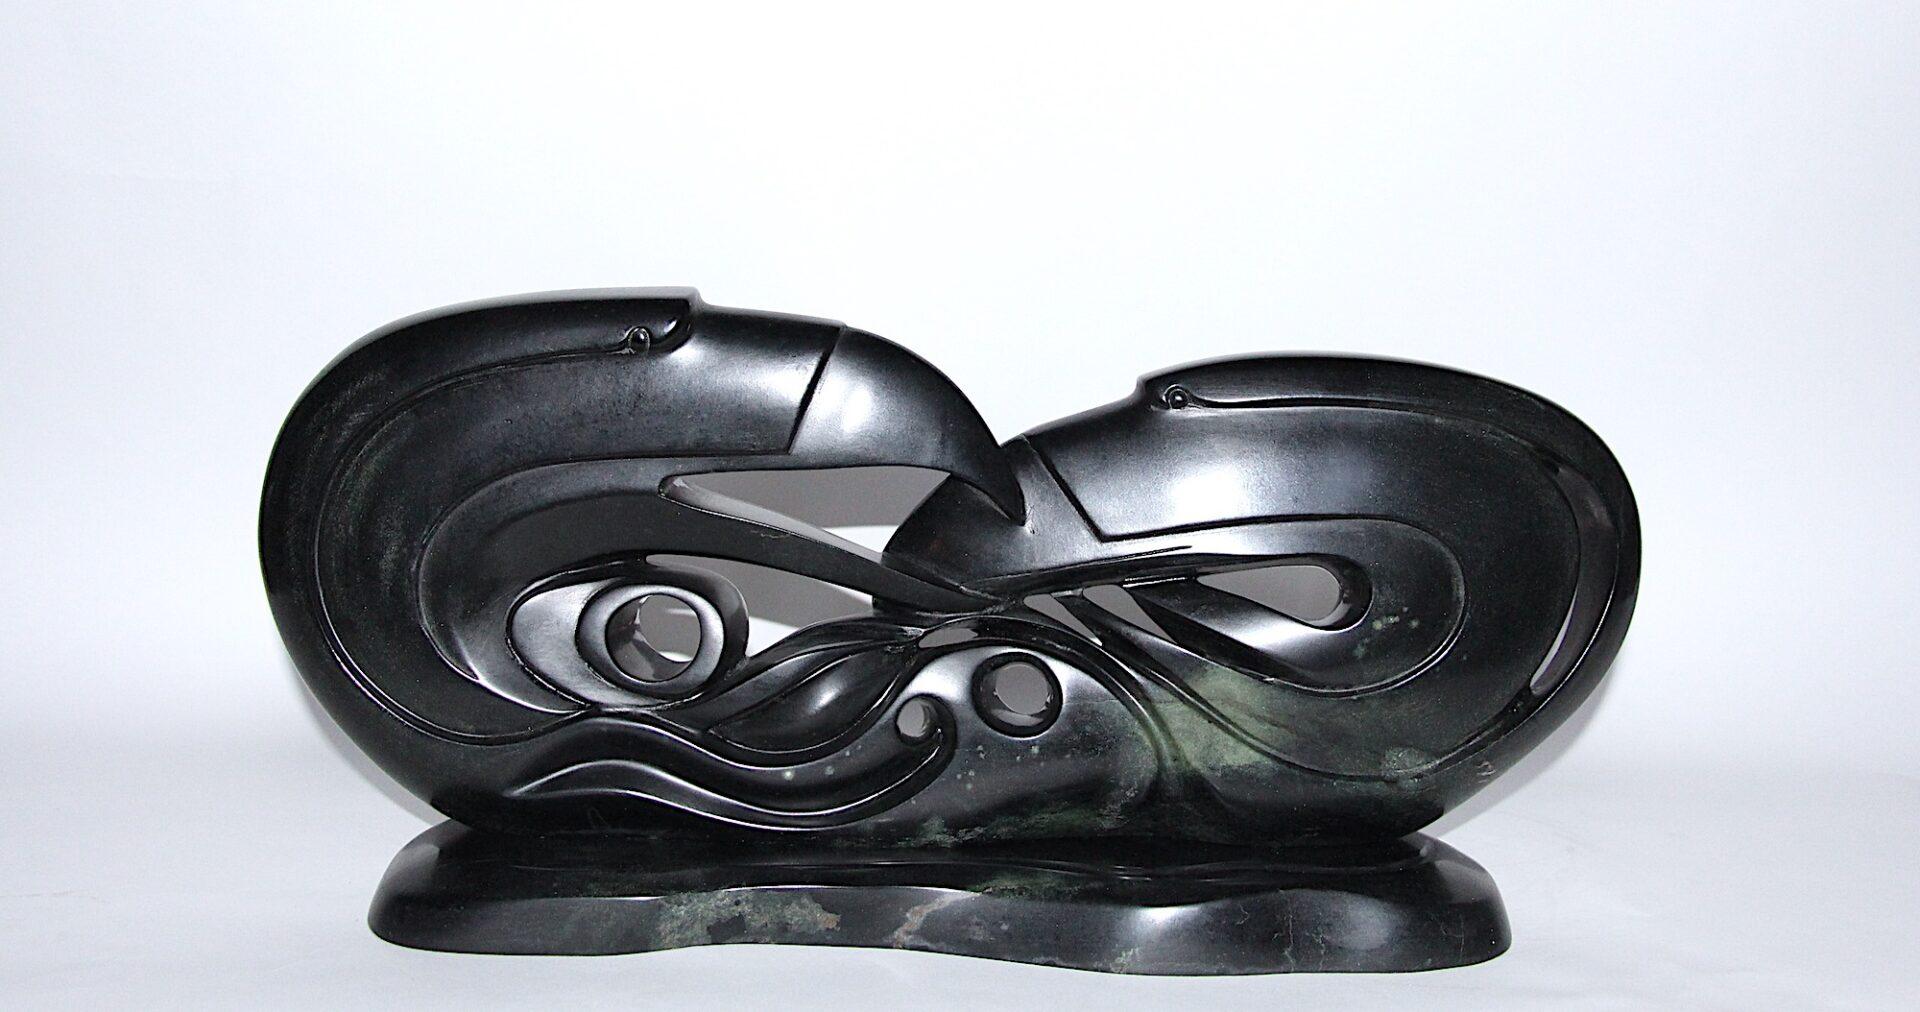 strong bond first nations Art Sculpture in Serpentine